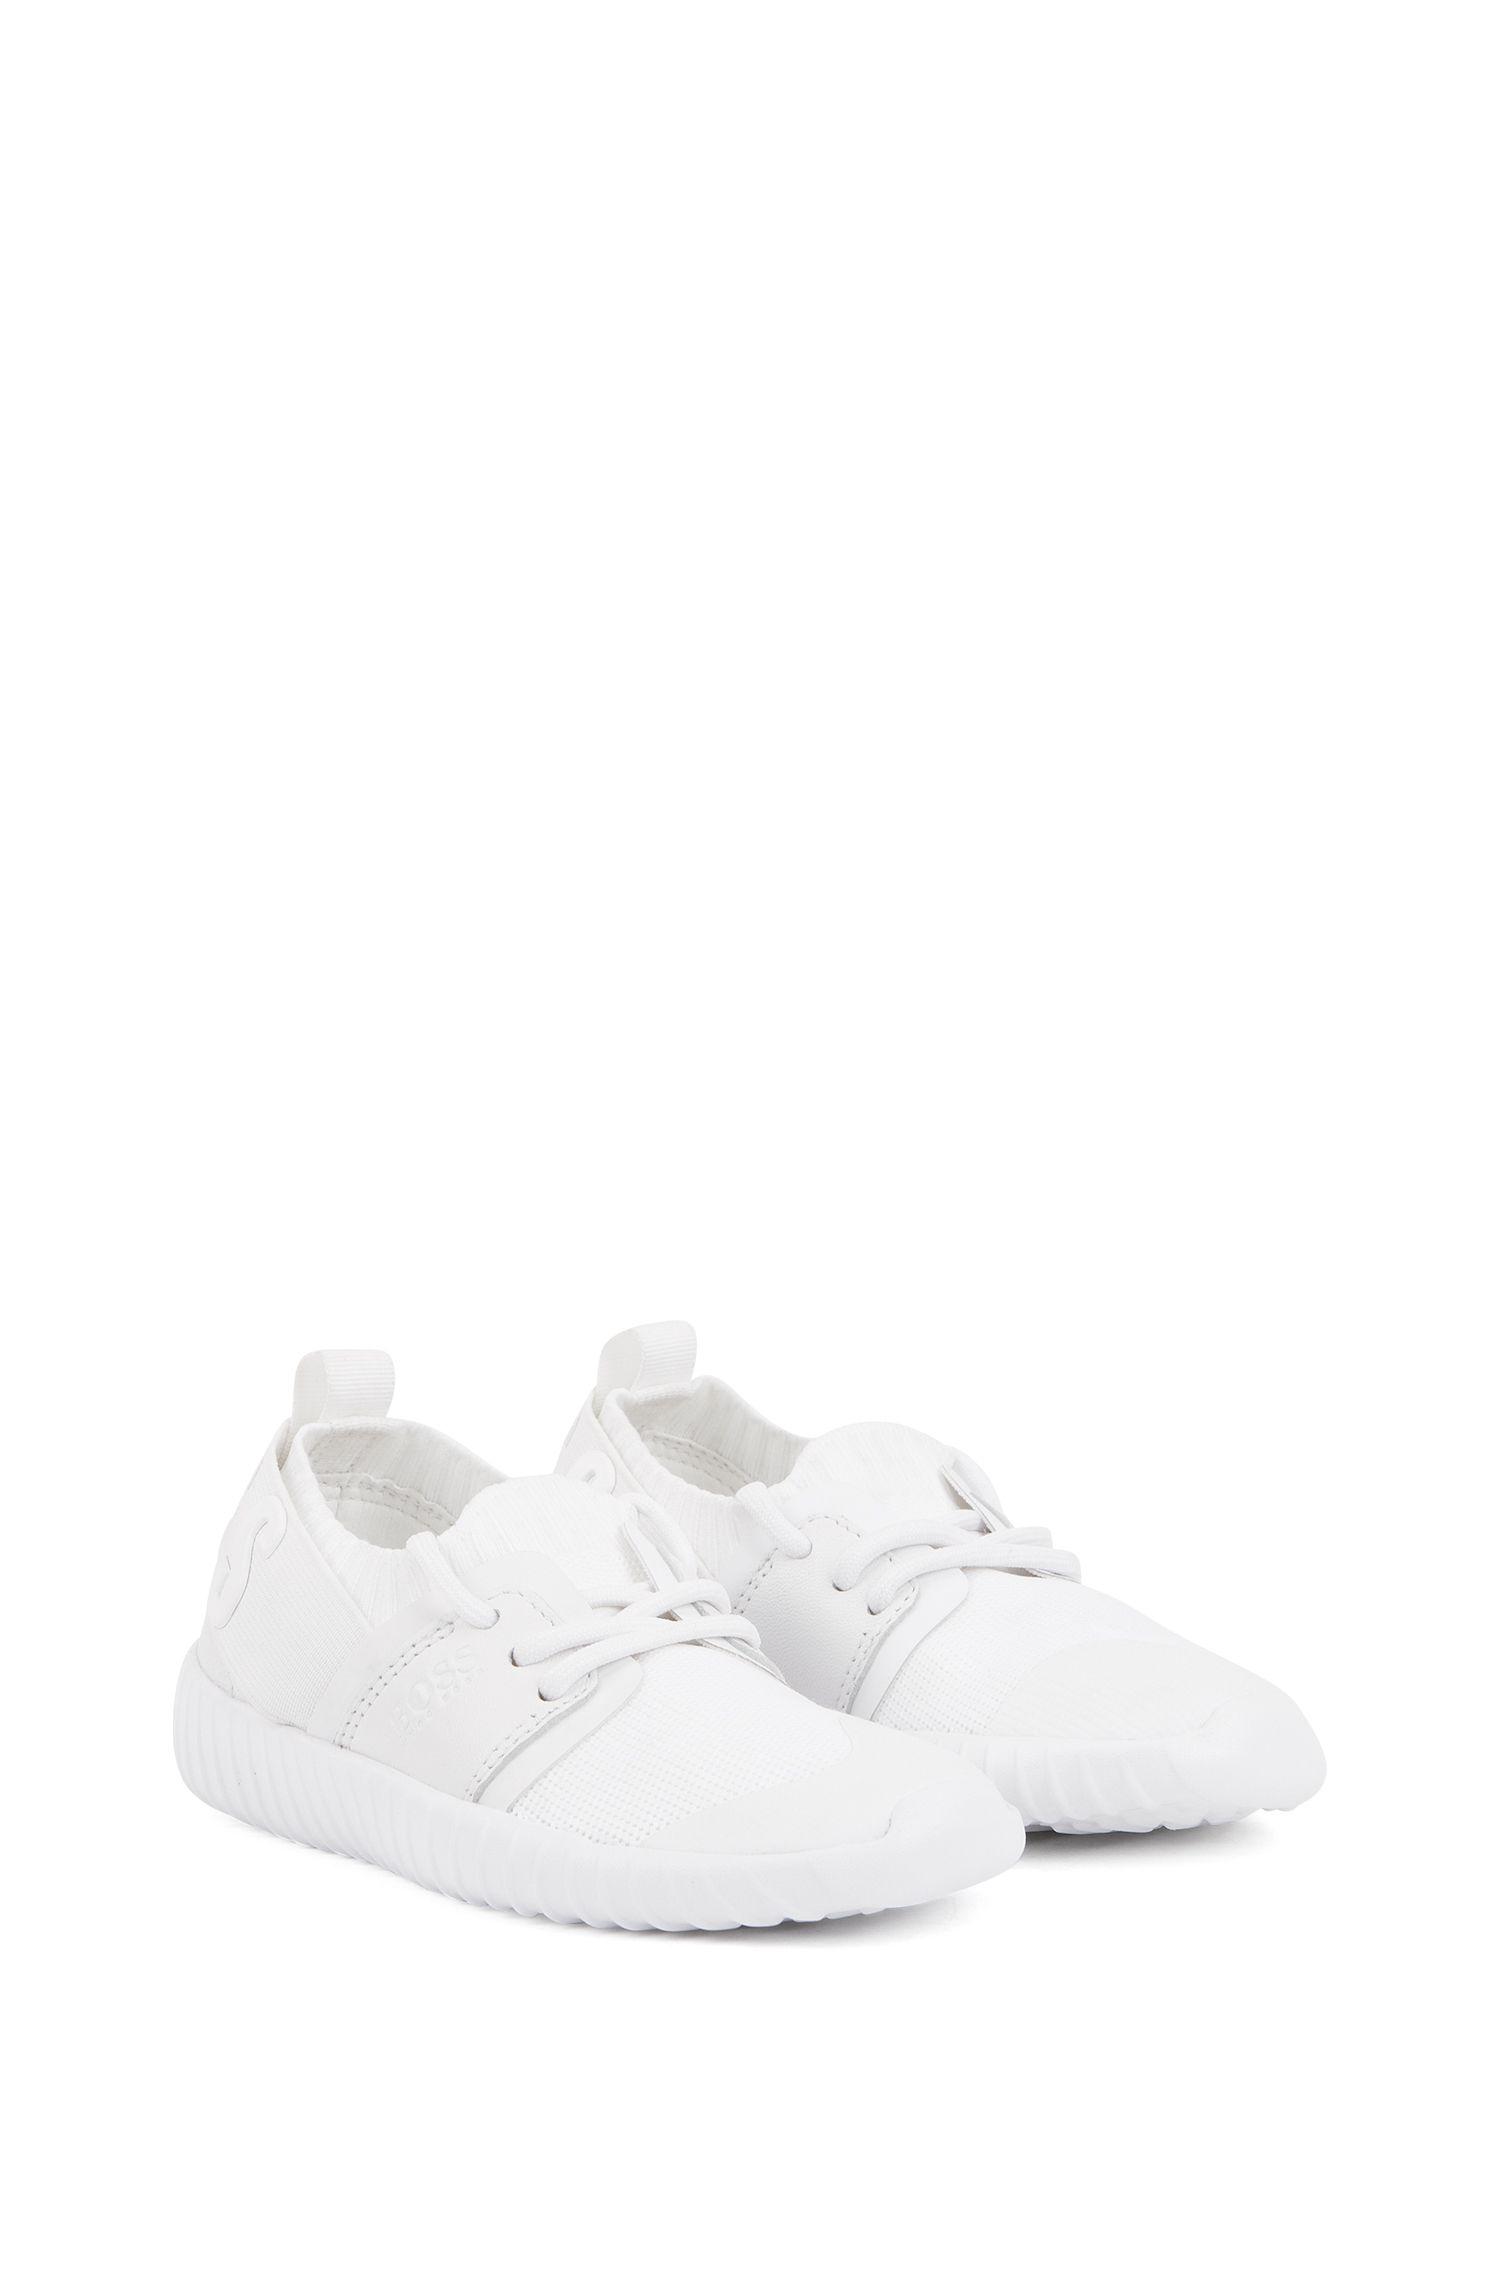 Kids-Sneakers aus Material-Mix mit erhöhtem Logo, Weiß